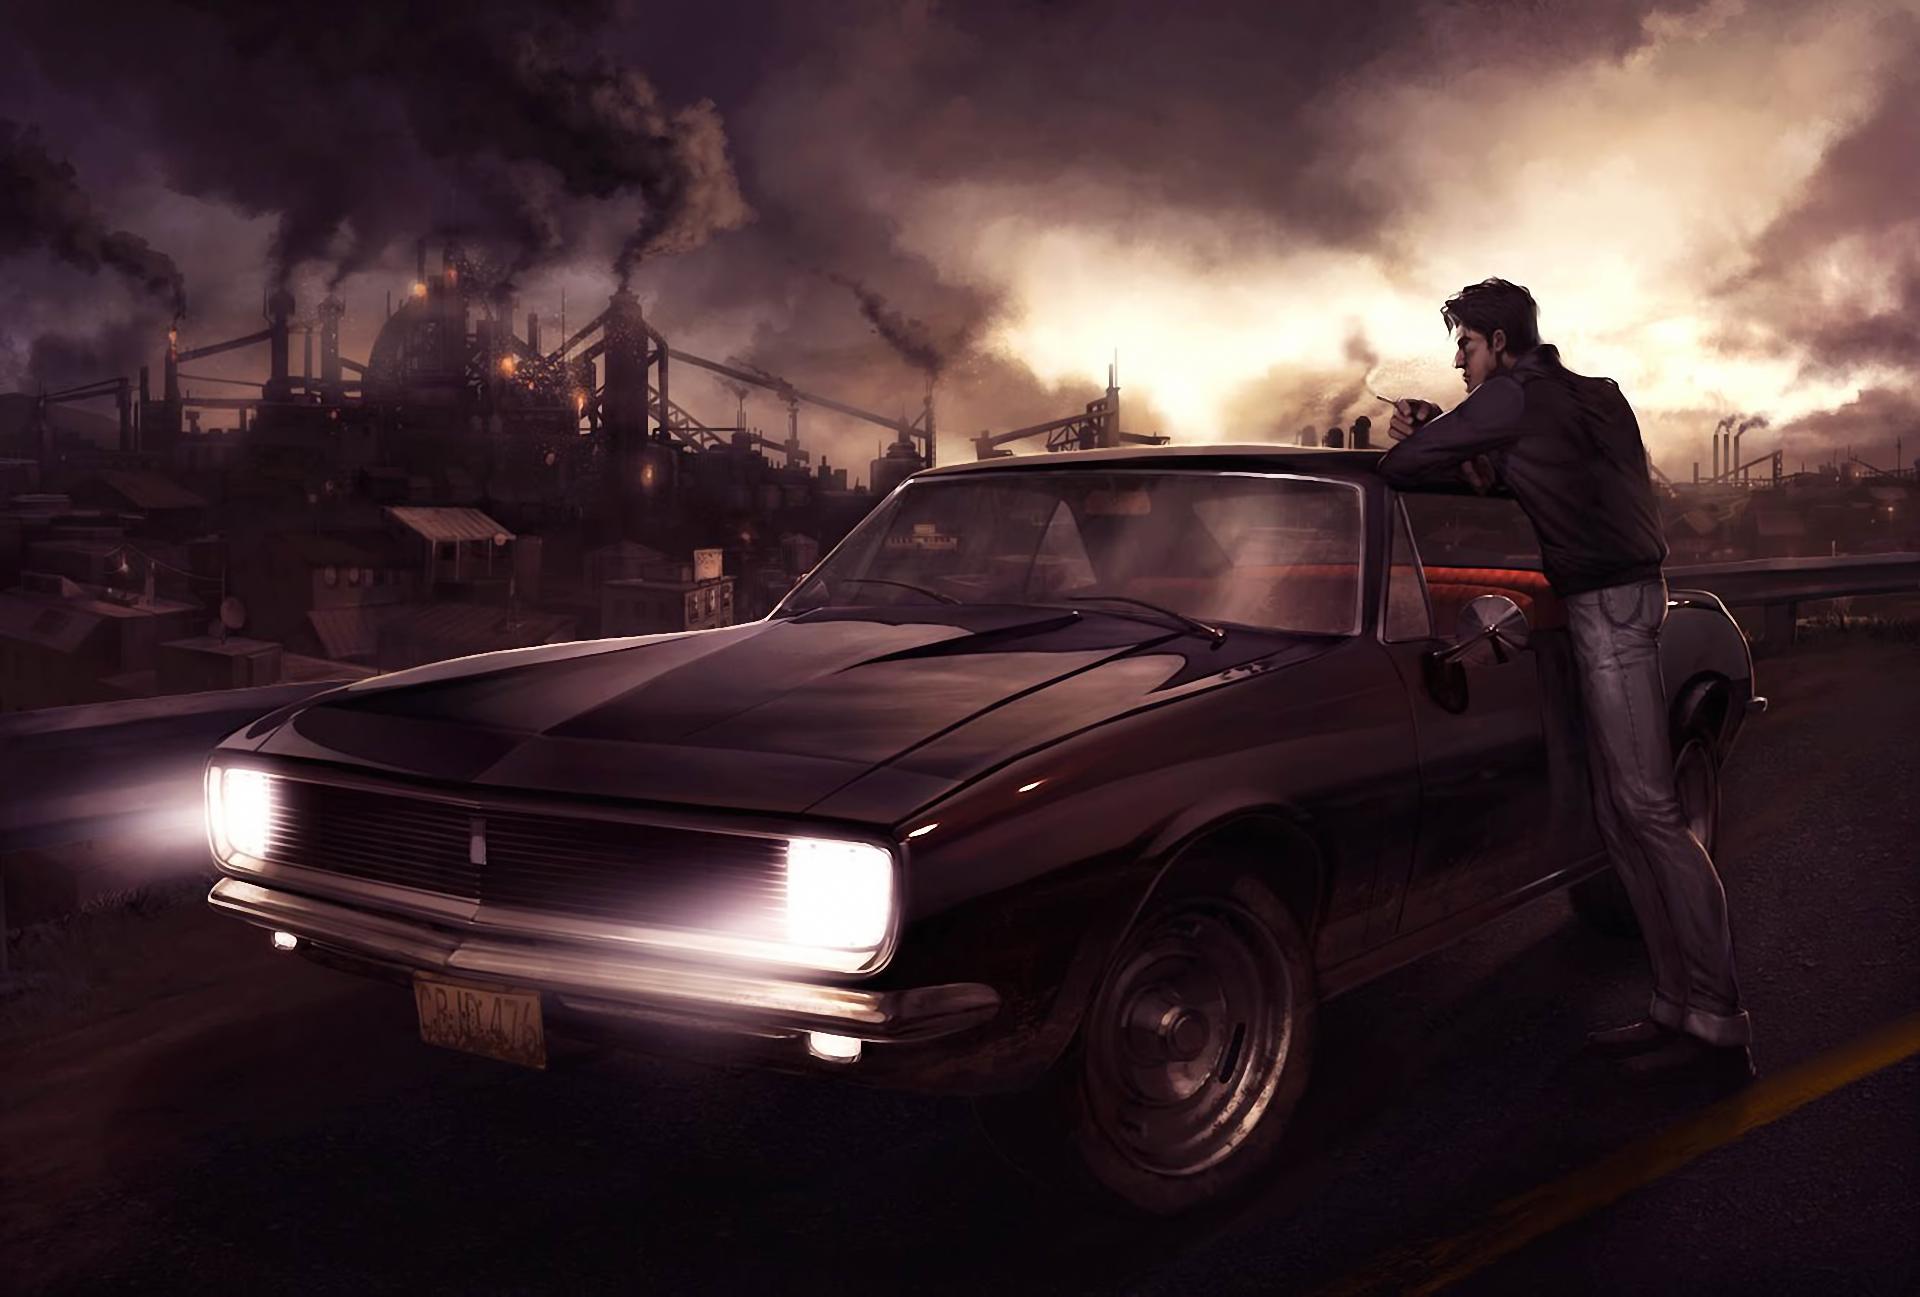 Alpha Coders Car Wallpapers Drake Metal City Hd Wallpaper Background Image